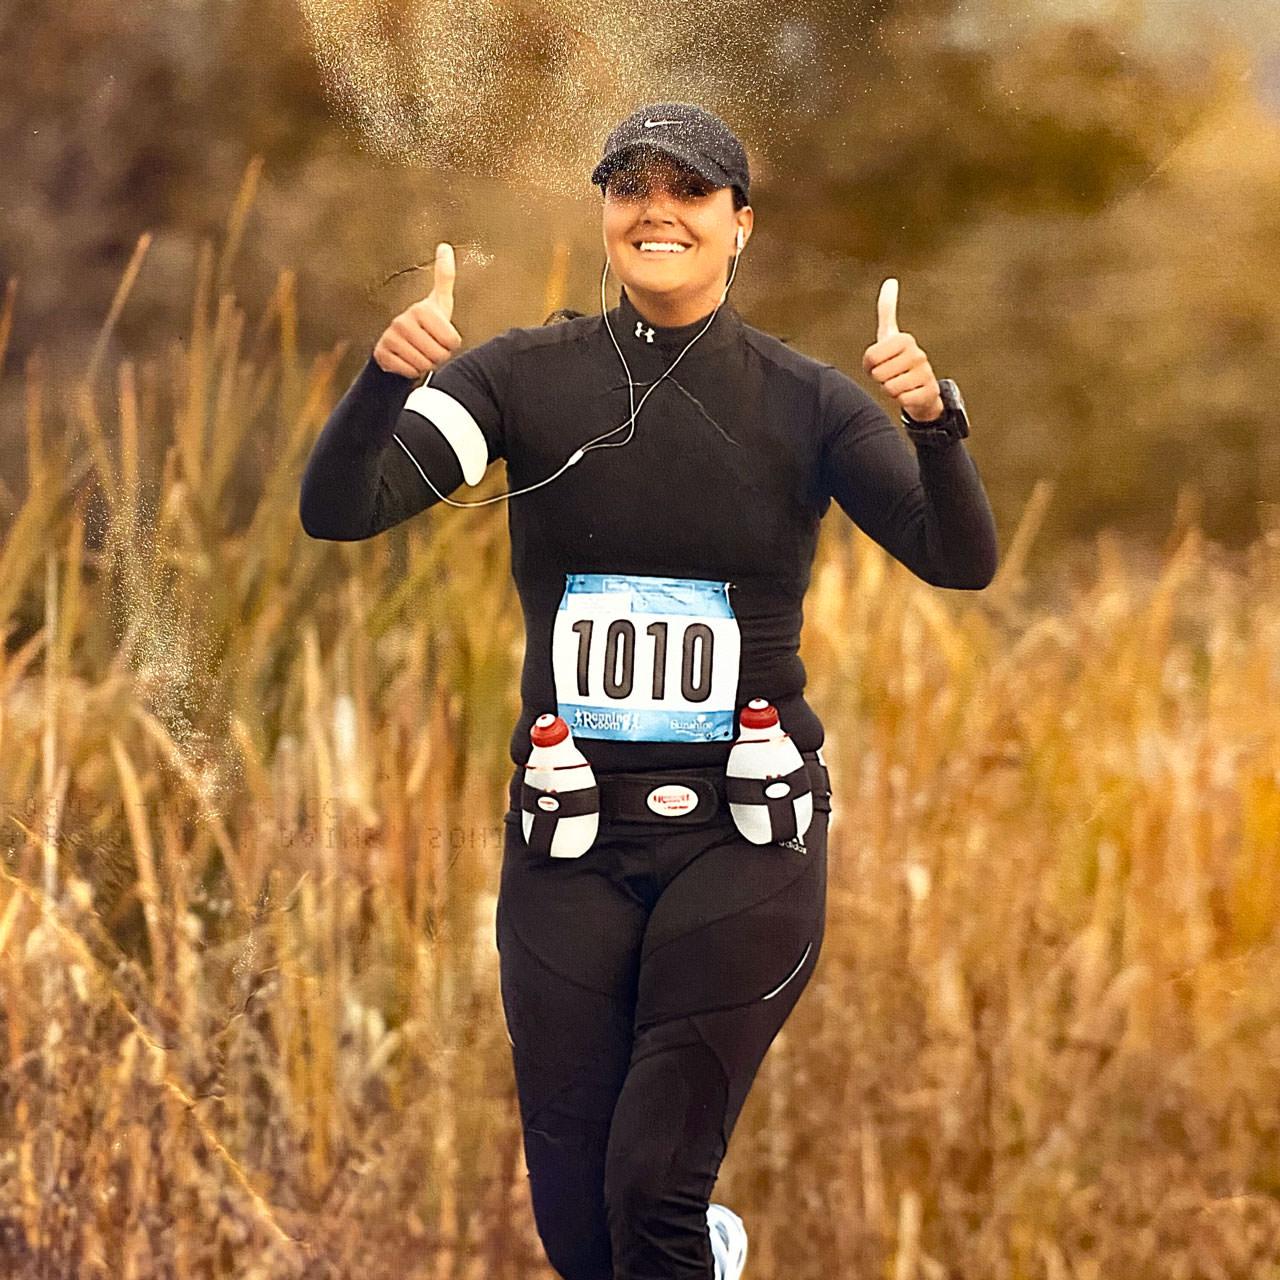 sonia-workman-marathon